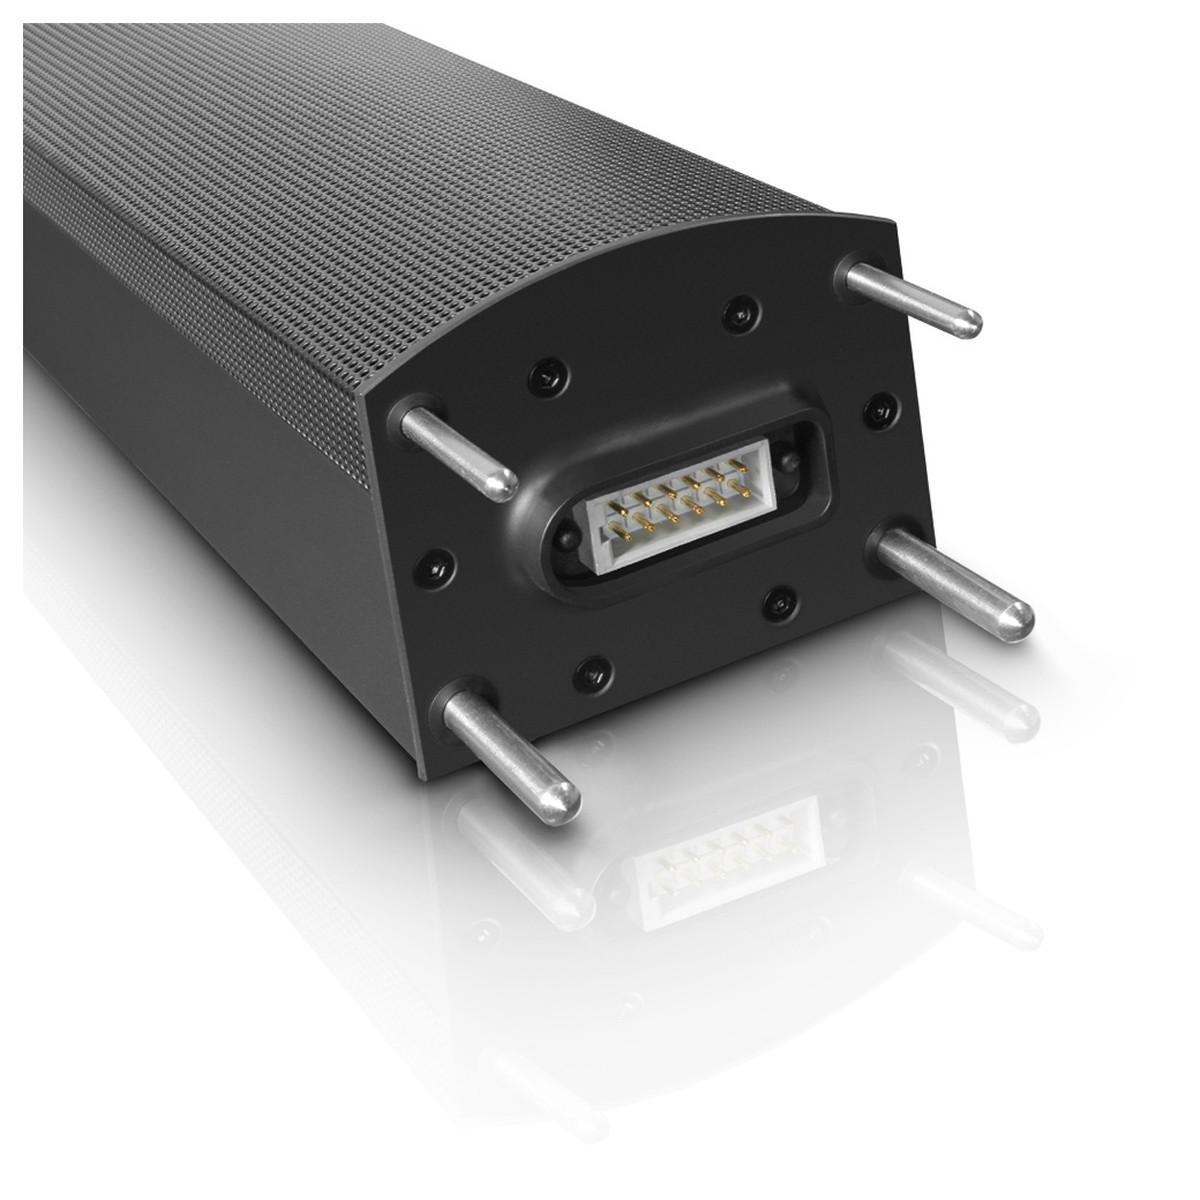 LD Systems MAUI 28 kompakt Line-Array PA System bei Gear4music